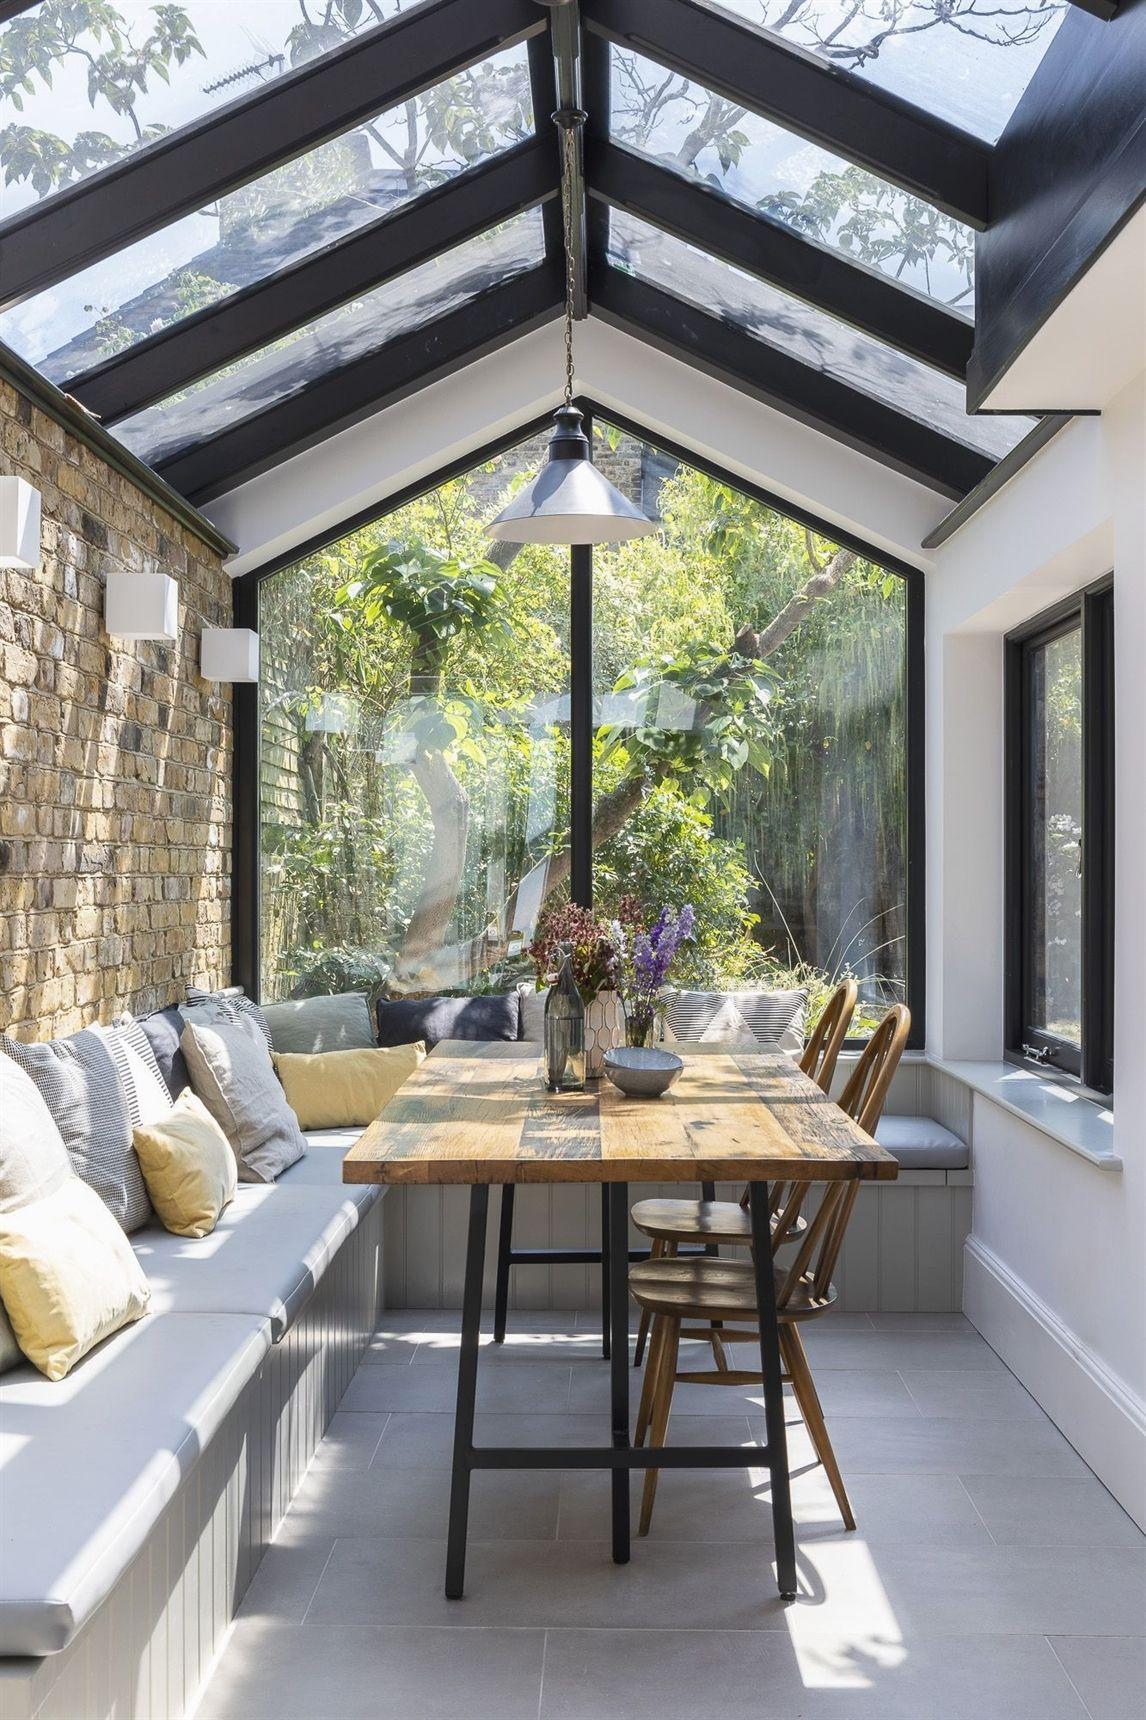 interiordesignideas indoor spaces in 2019 home painting kitchen rh pinterest com